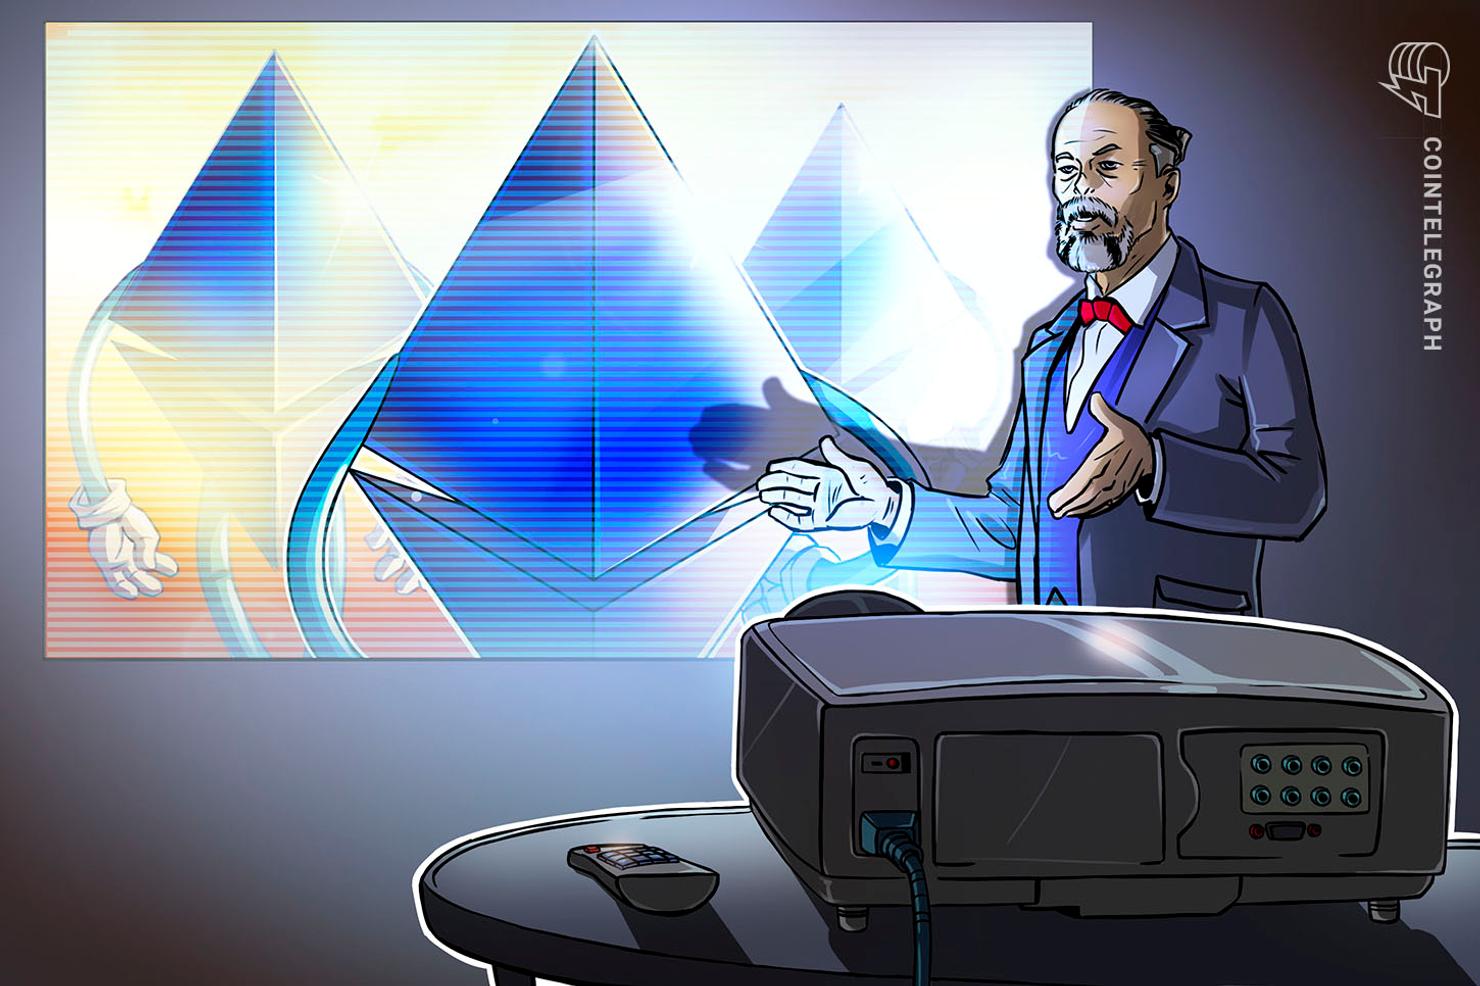 Zmudzinski bitcoin-friendly square cash